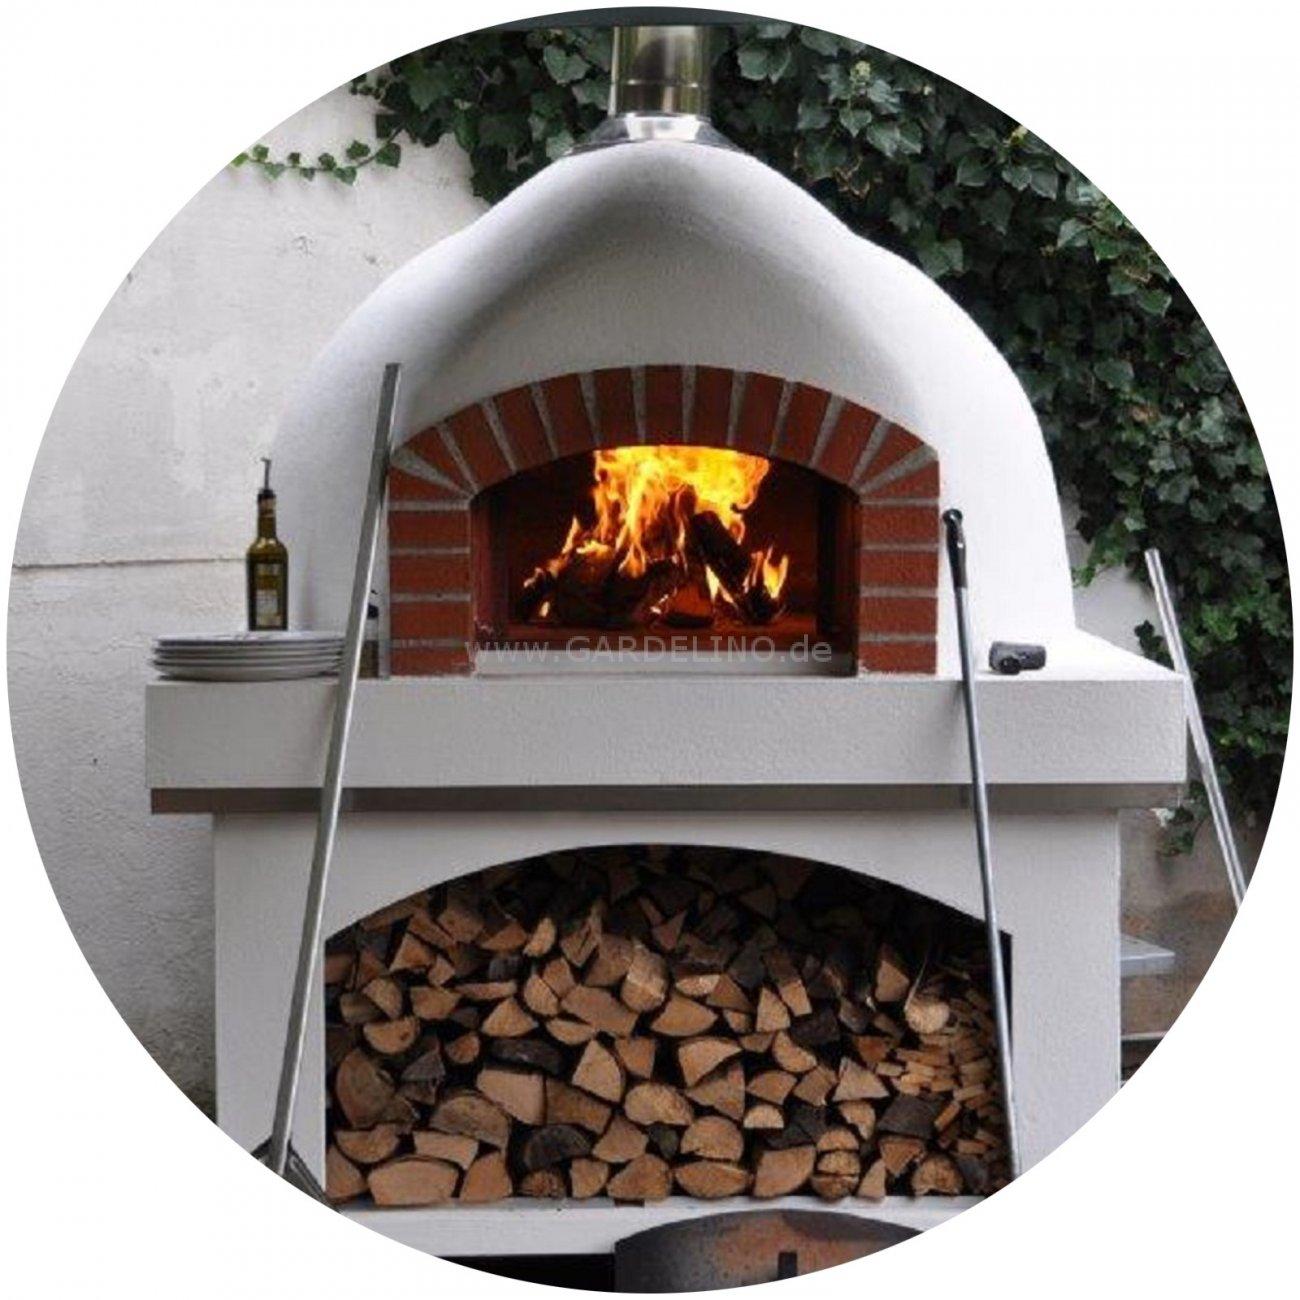 pizzaofen selber bauen mit bausatz fvr gardelino. Black Bedroom Furniture Sets. Home Design Ideas